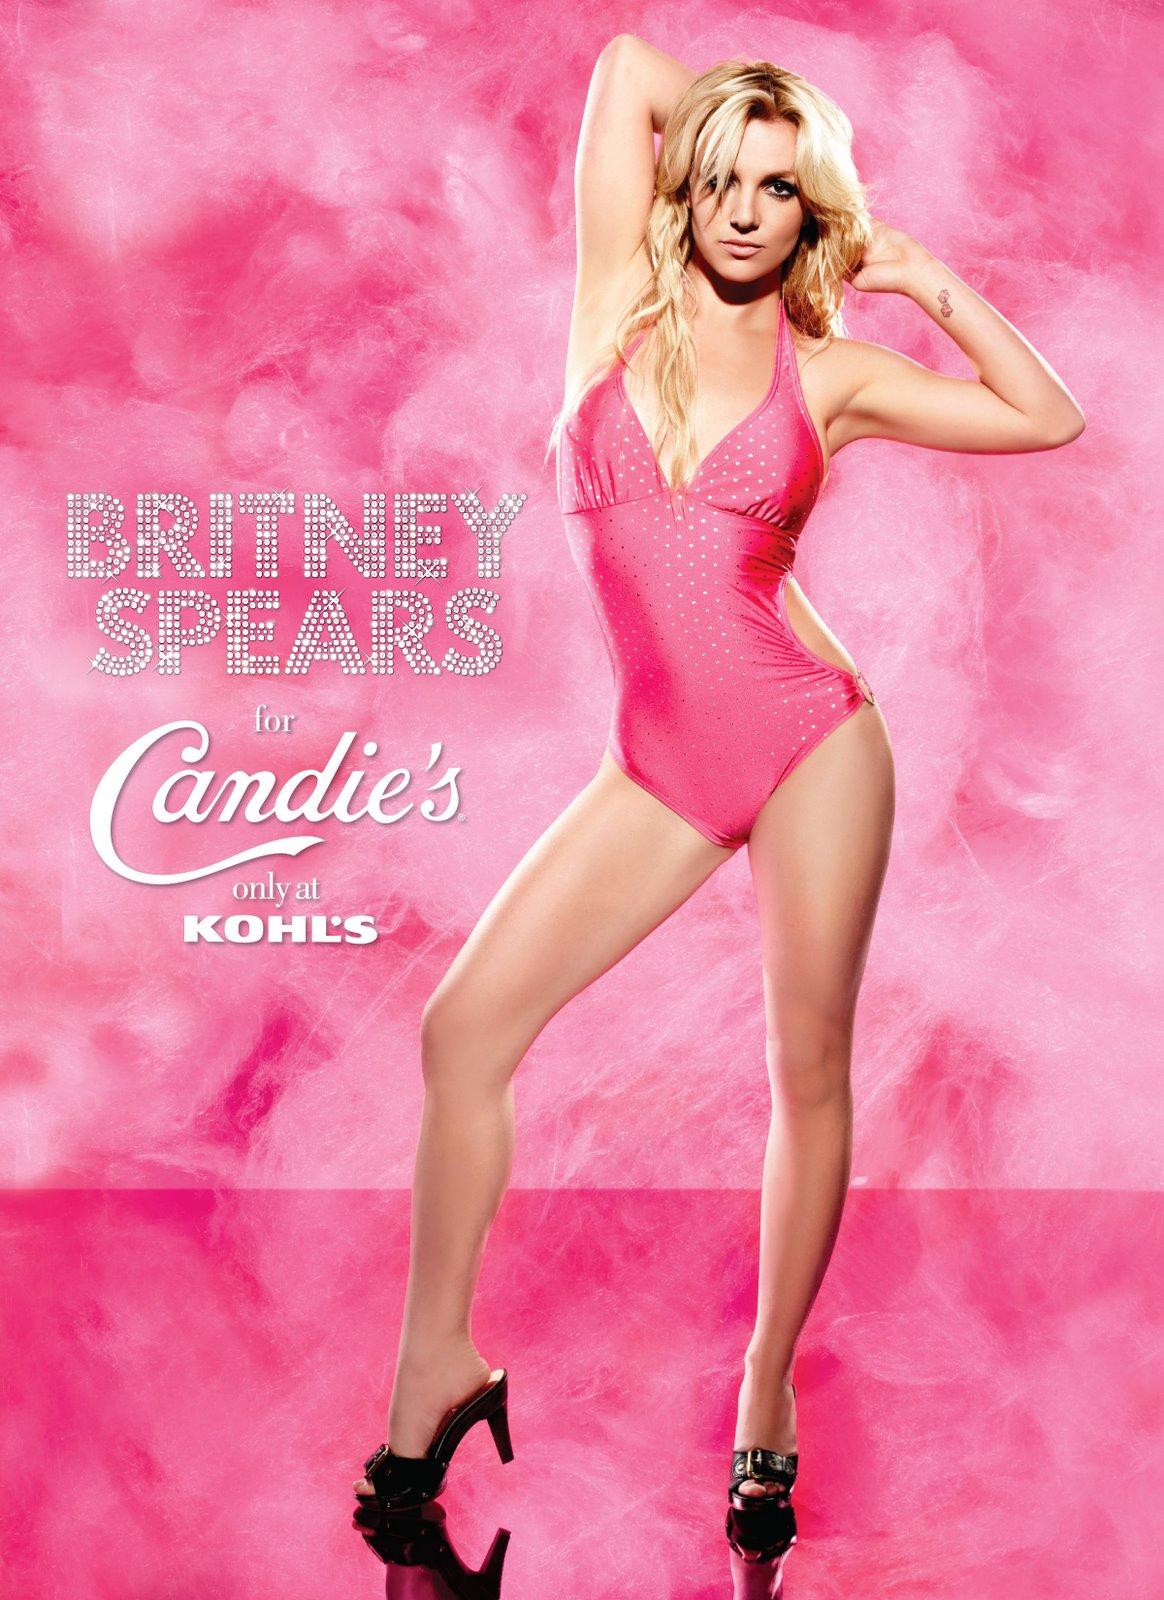 http://3.bp.blogspot.com/_rdSmMMJJj5M/TEfSz-BewBI/AAAAAAAAA-s/vtgg3NX0KFc/s1600/Britney-Spears-after-Photoshop+3.jpg